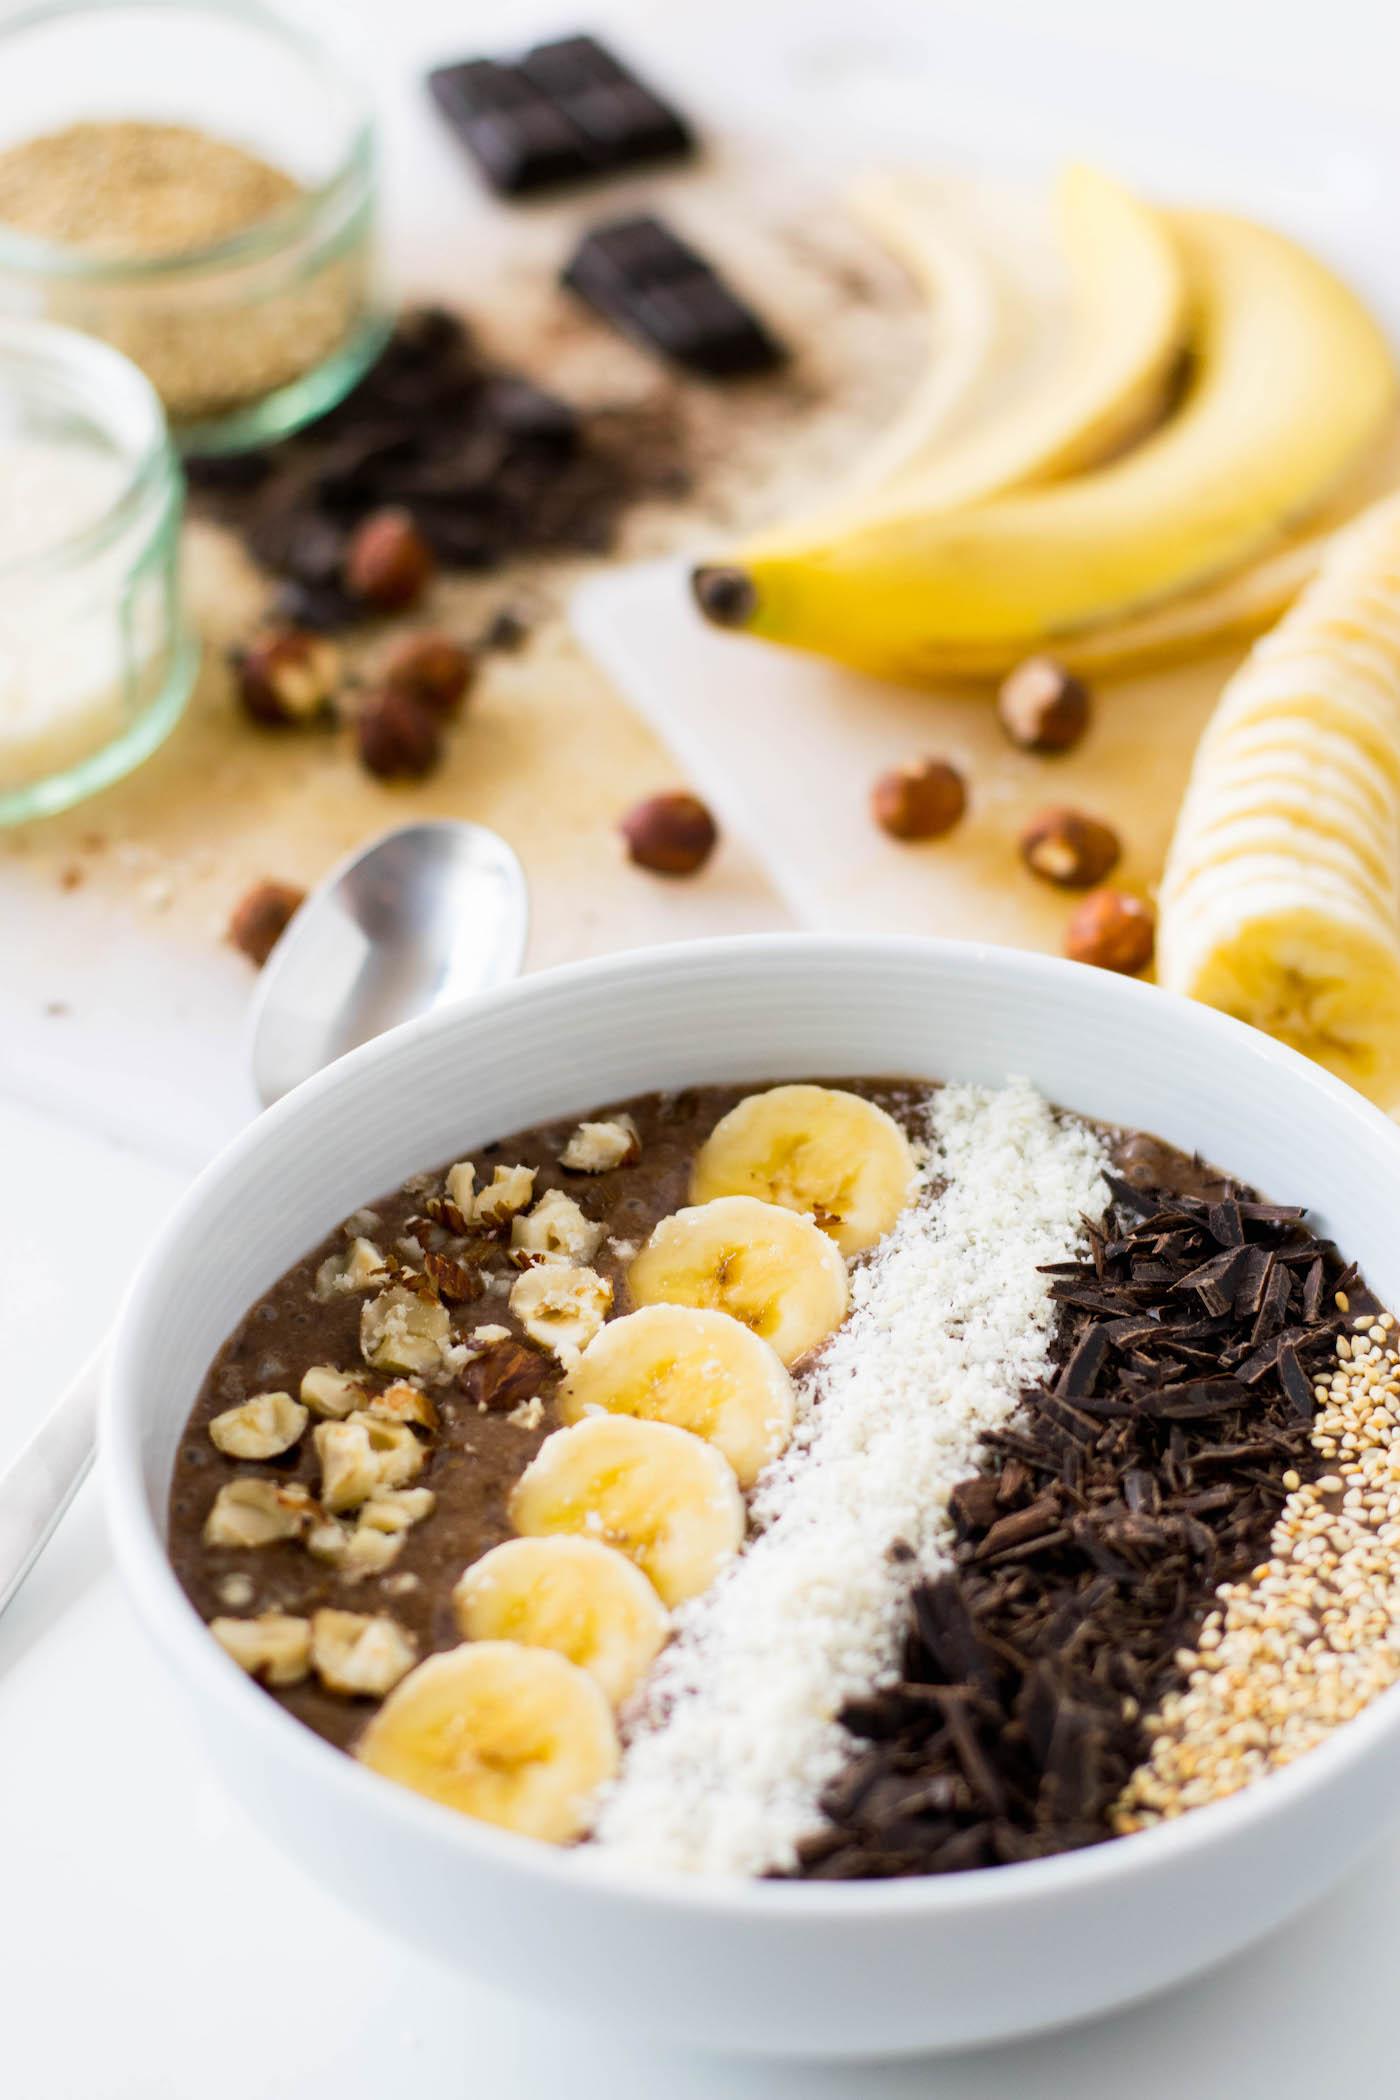 smoothie-bowl-chocolat-noisette-2.jpg